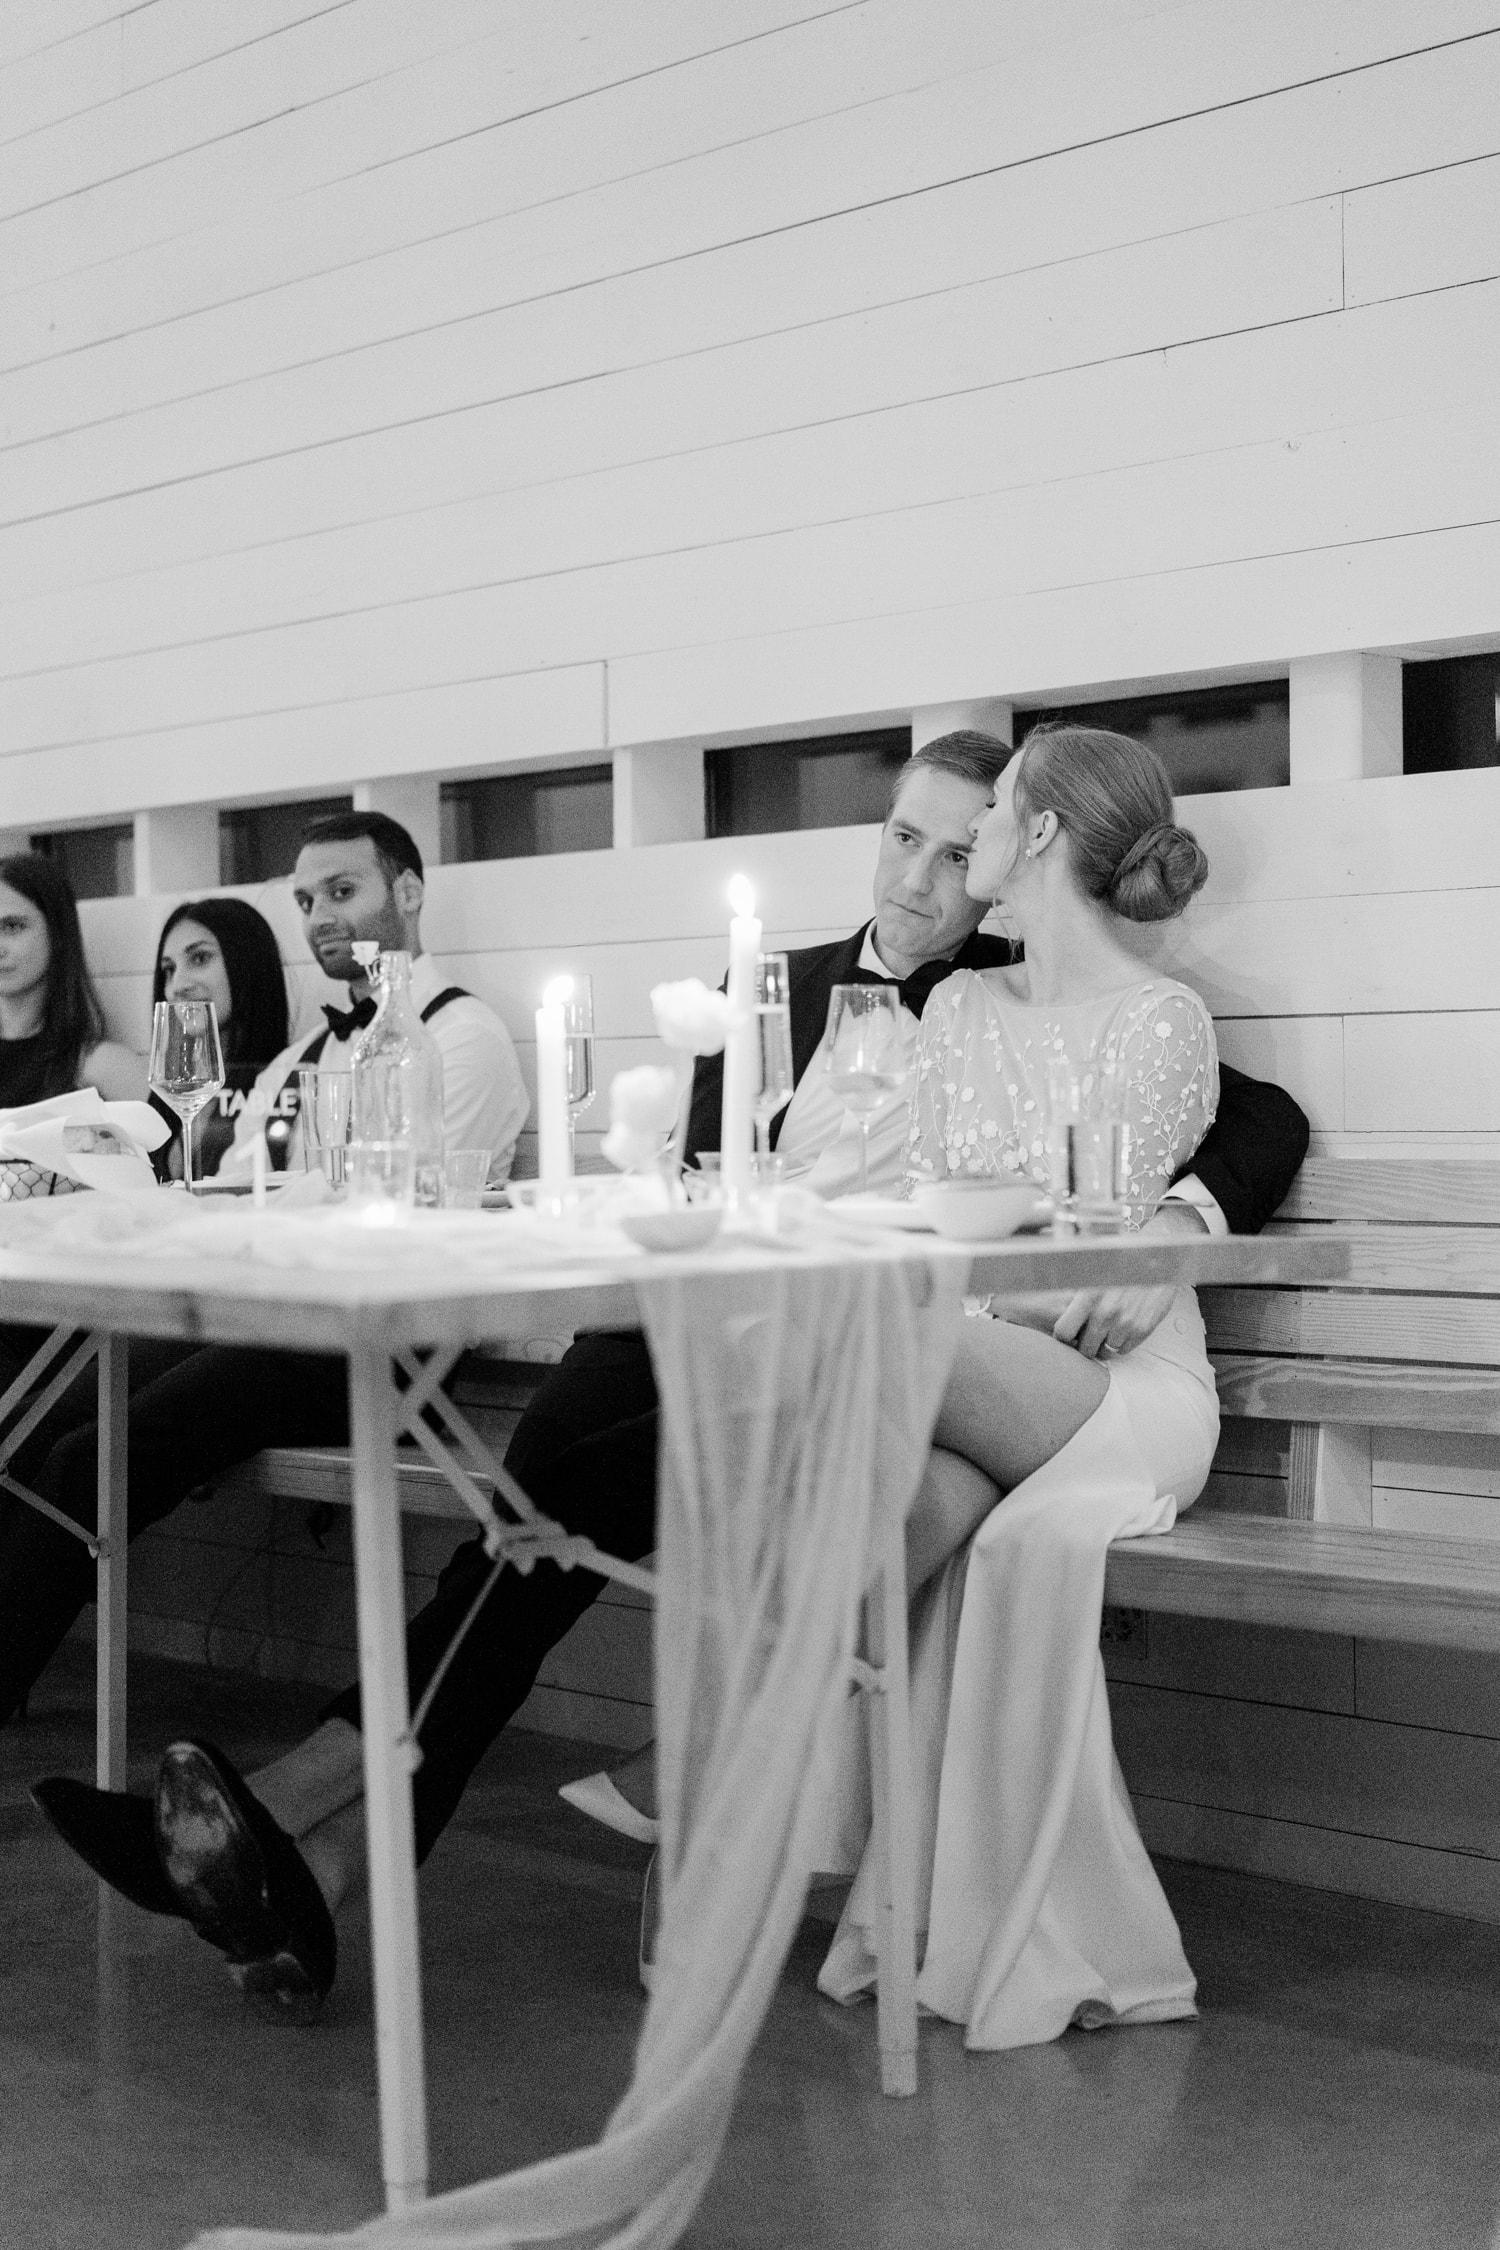 PROSPECT_HOUSE_WEDDING_AUSTIN_TX_MATTHEW_MOORE-00922.jpg